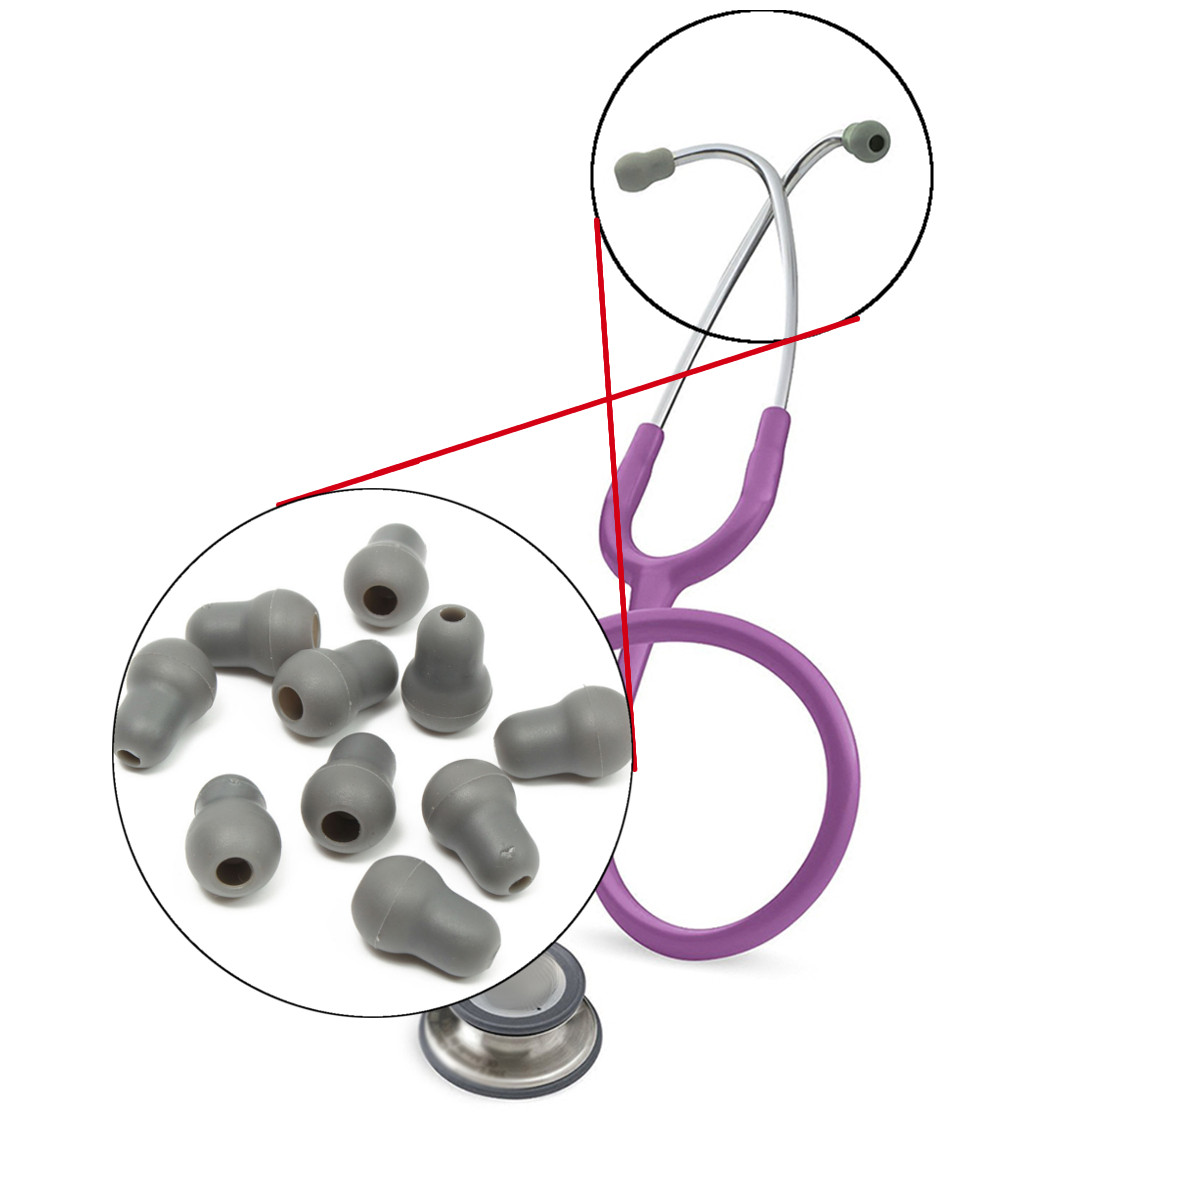 10pcs-super-comfortable-and-soft-stethoscope-earplug-eartips-earpieces-for-littmann-stethoscope